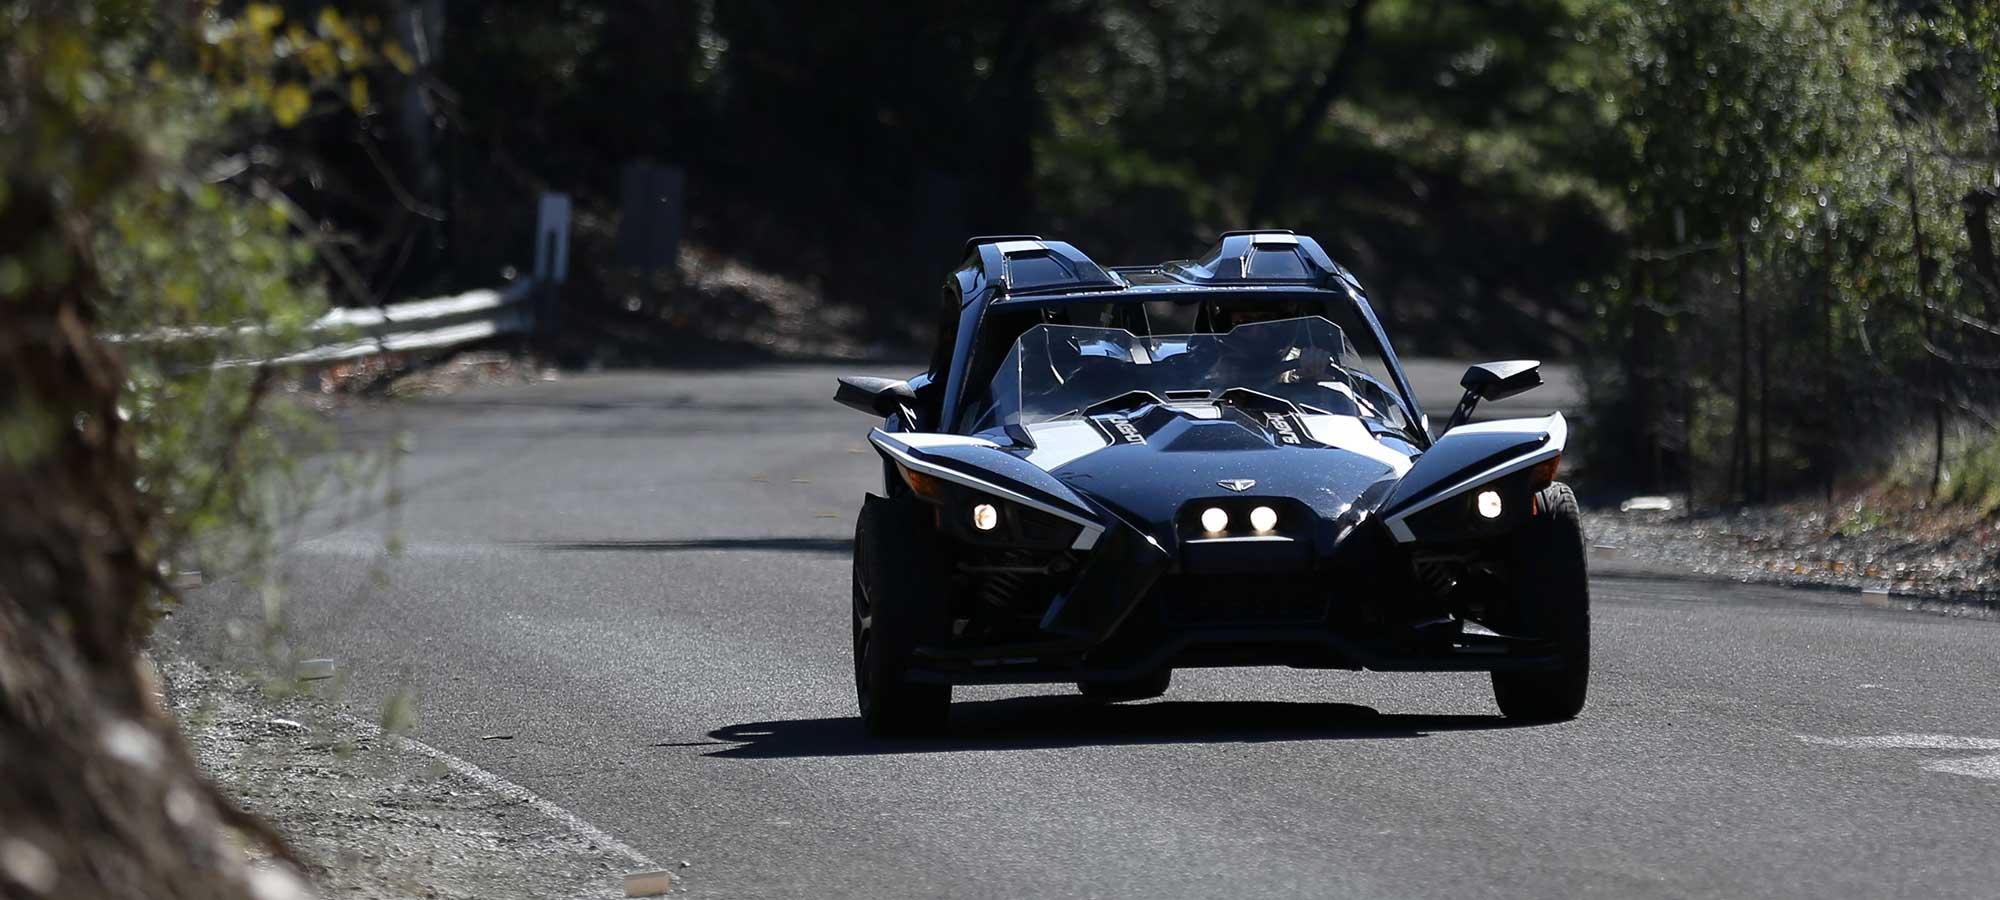 2019 Polaris Slingshot Grand Touring